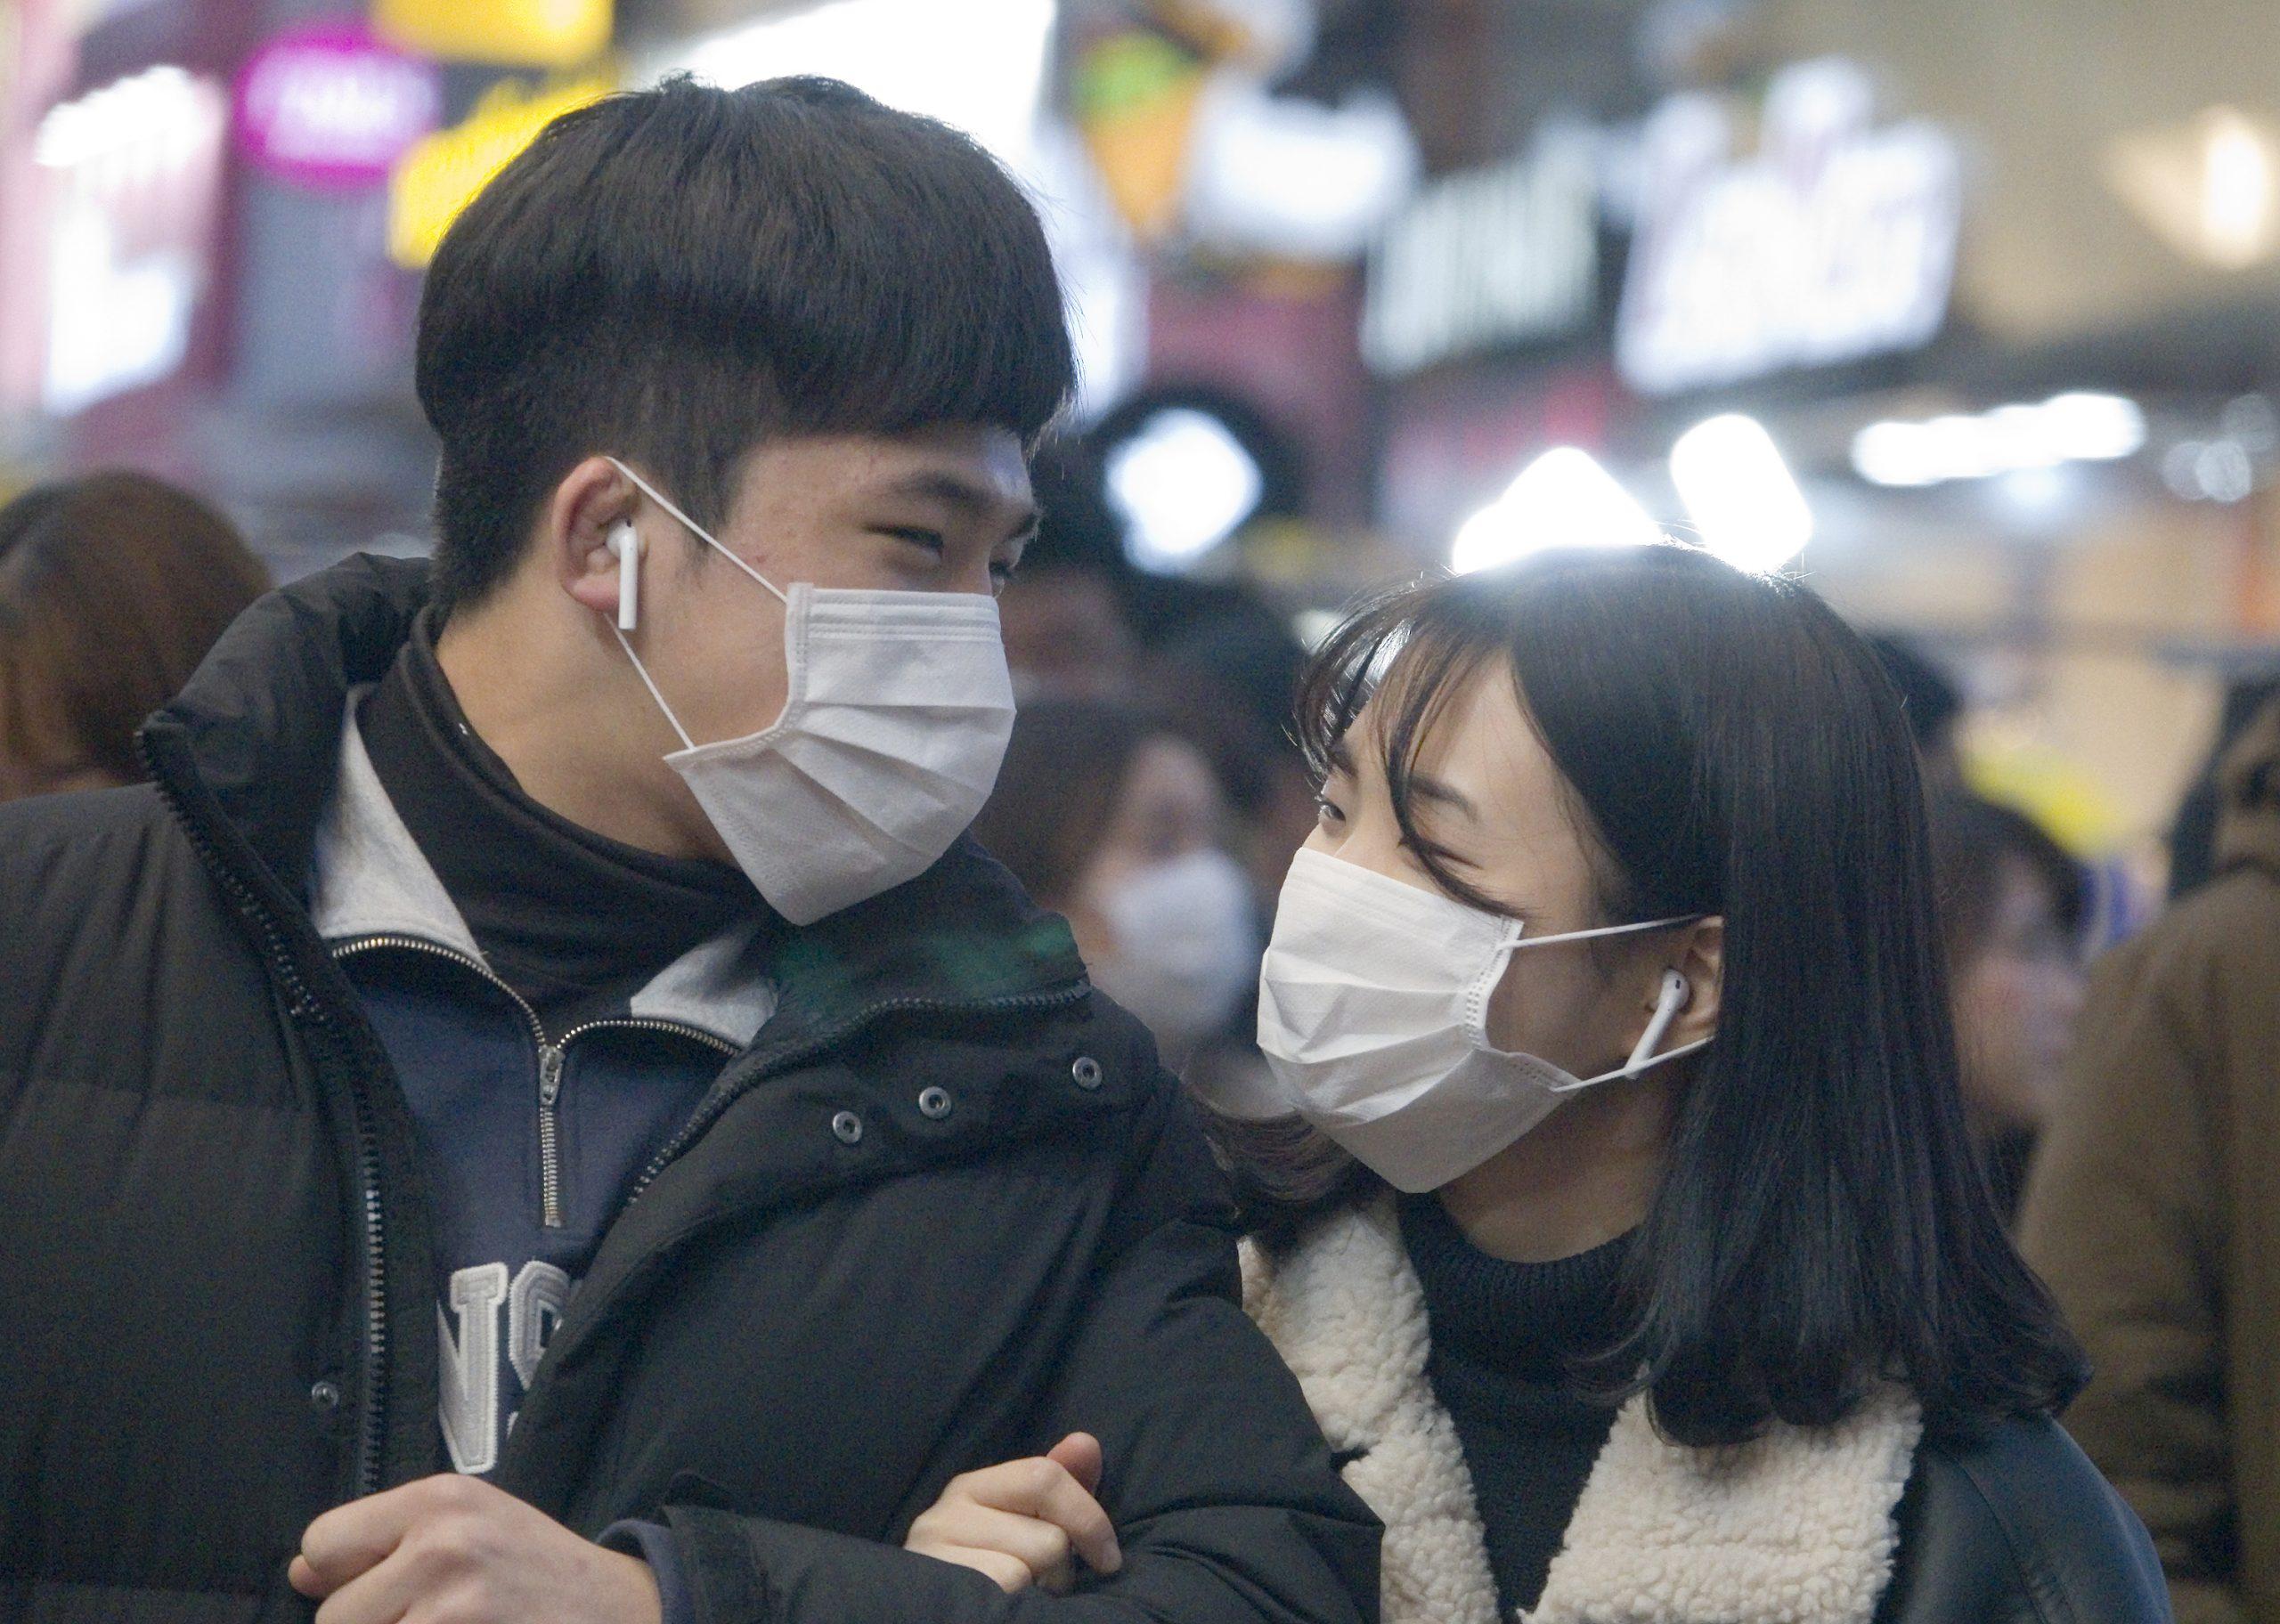 People wearing masks to protect against Coronavirus